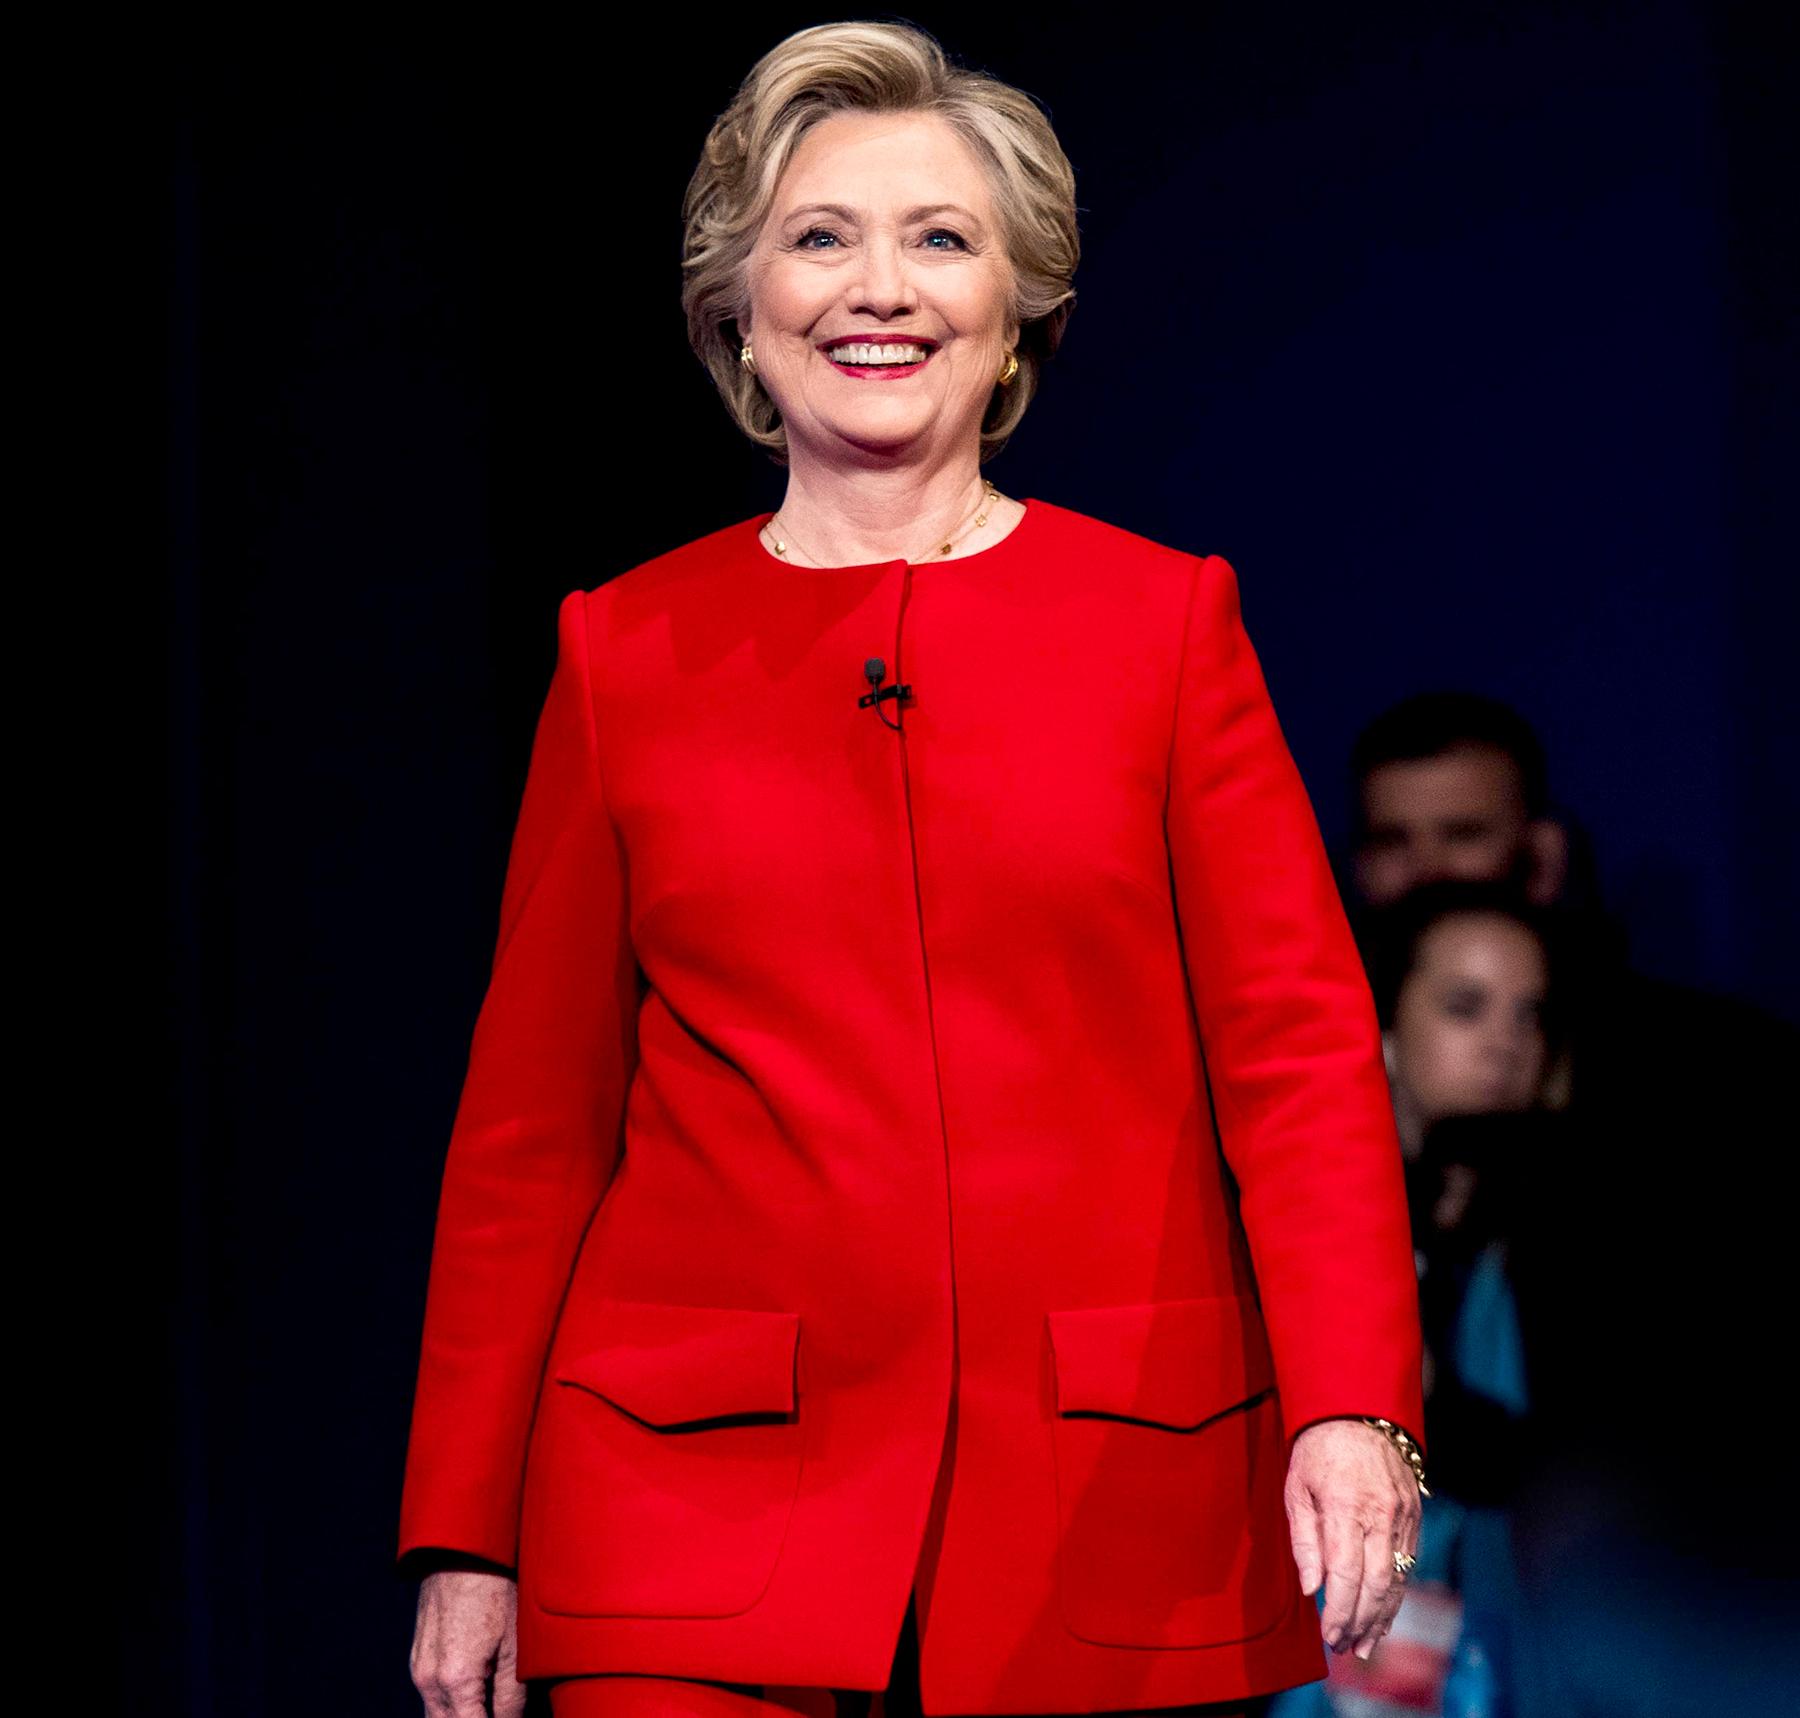 Hillary Clinton at Hofstra University in Hempstead, New York on Monday September 26, 2016.